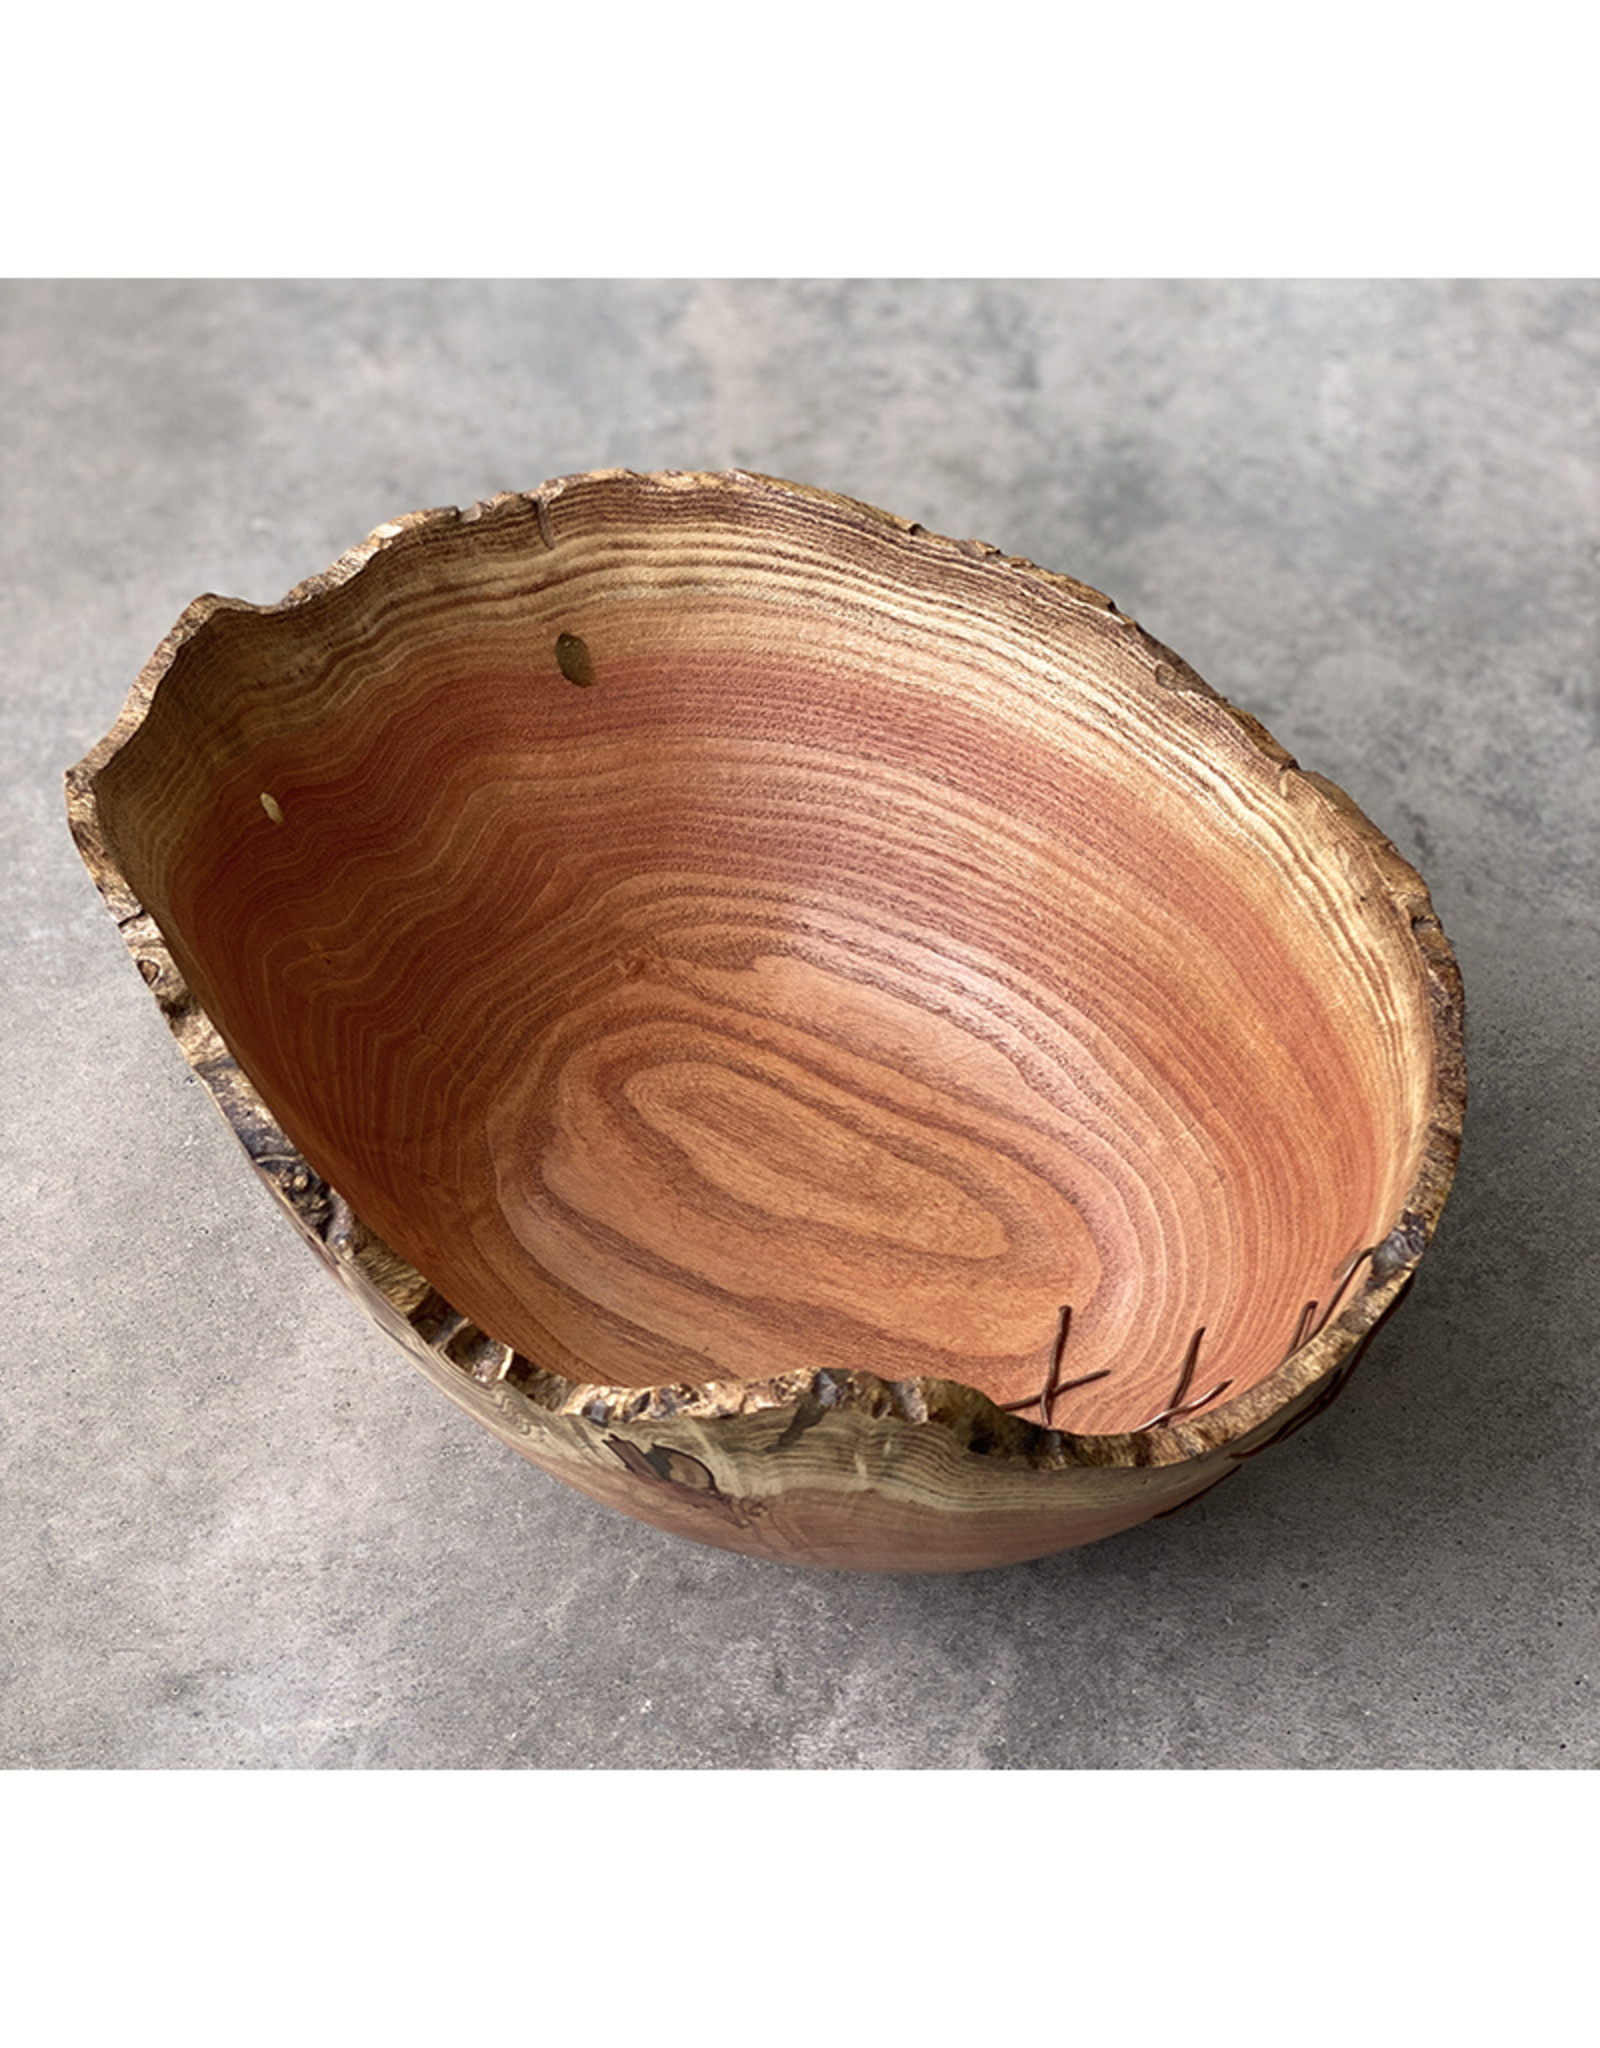 Resurrected Woodworks #41 // Matt Roman